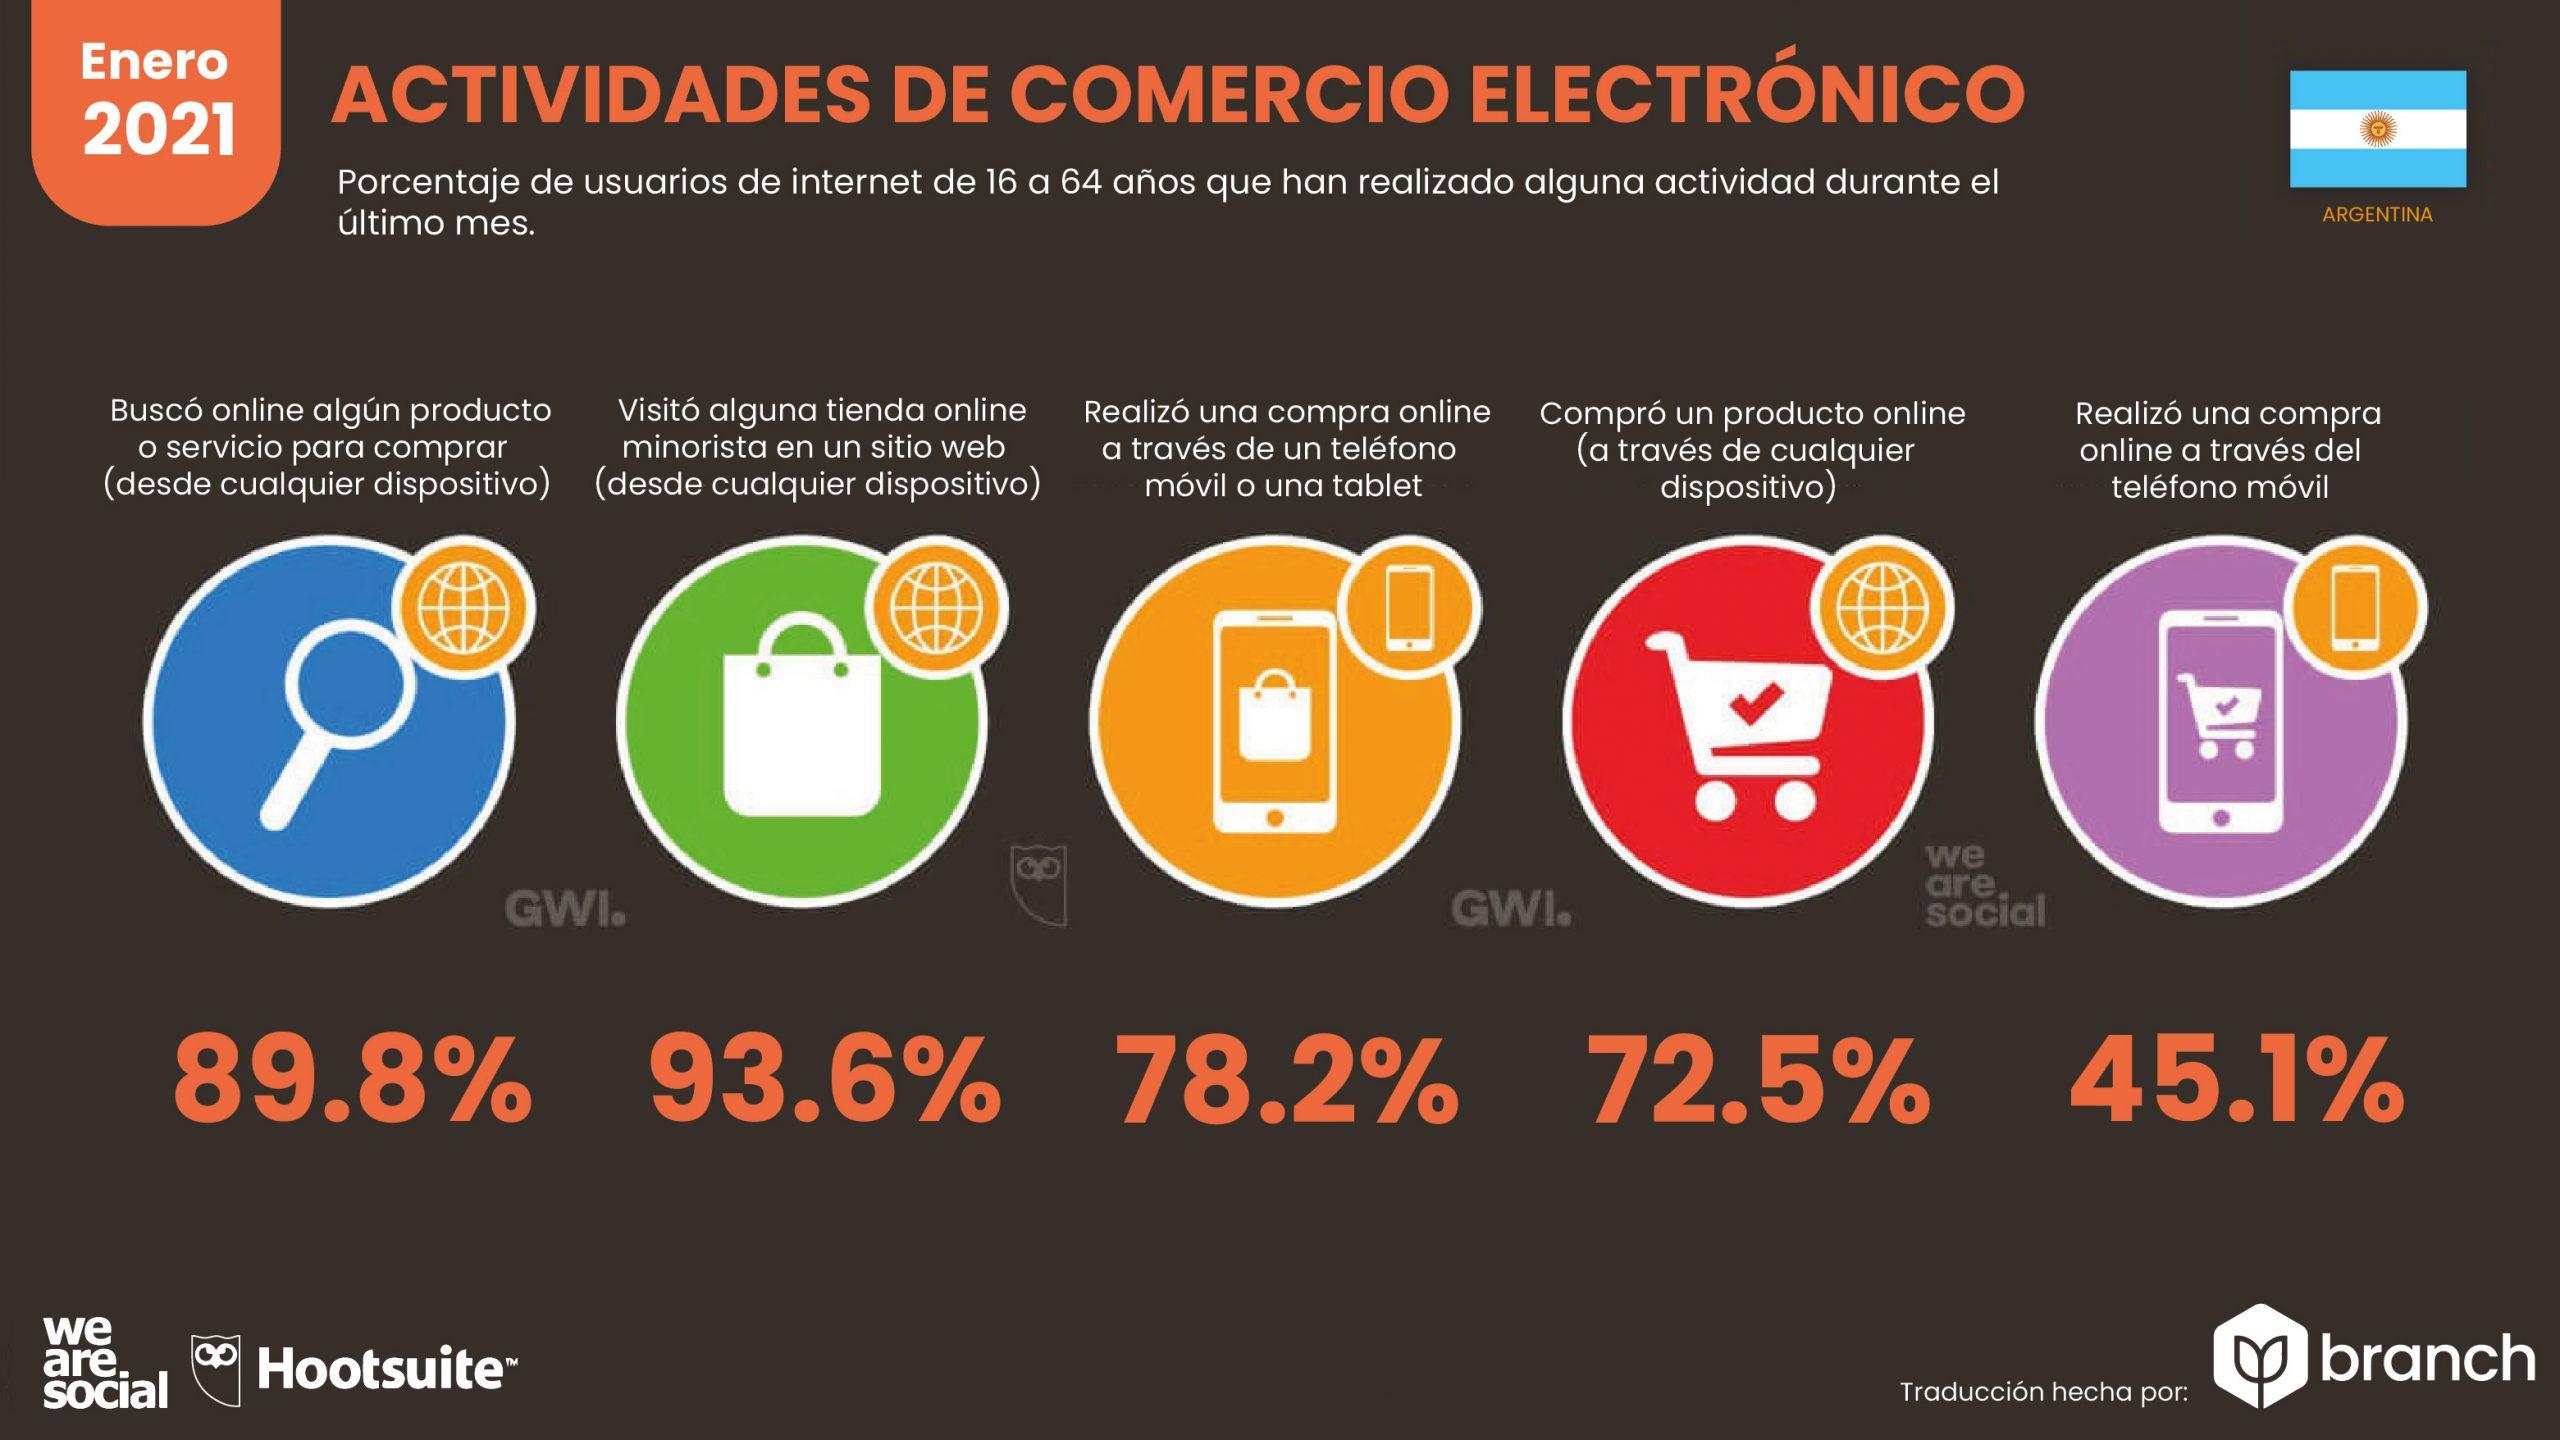 grafico-actividades-de-ecommerce-argentina-2020-2021